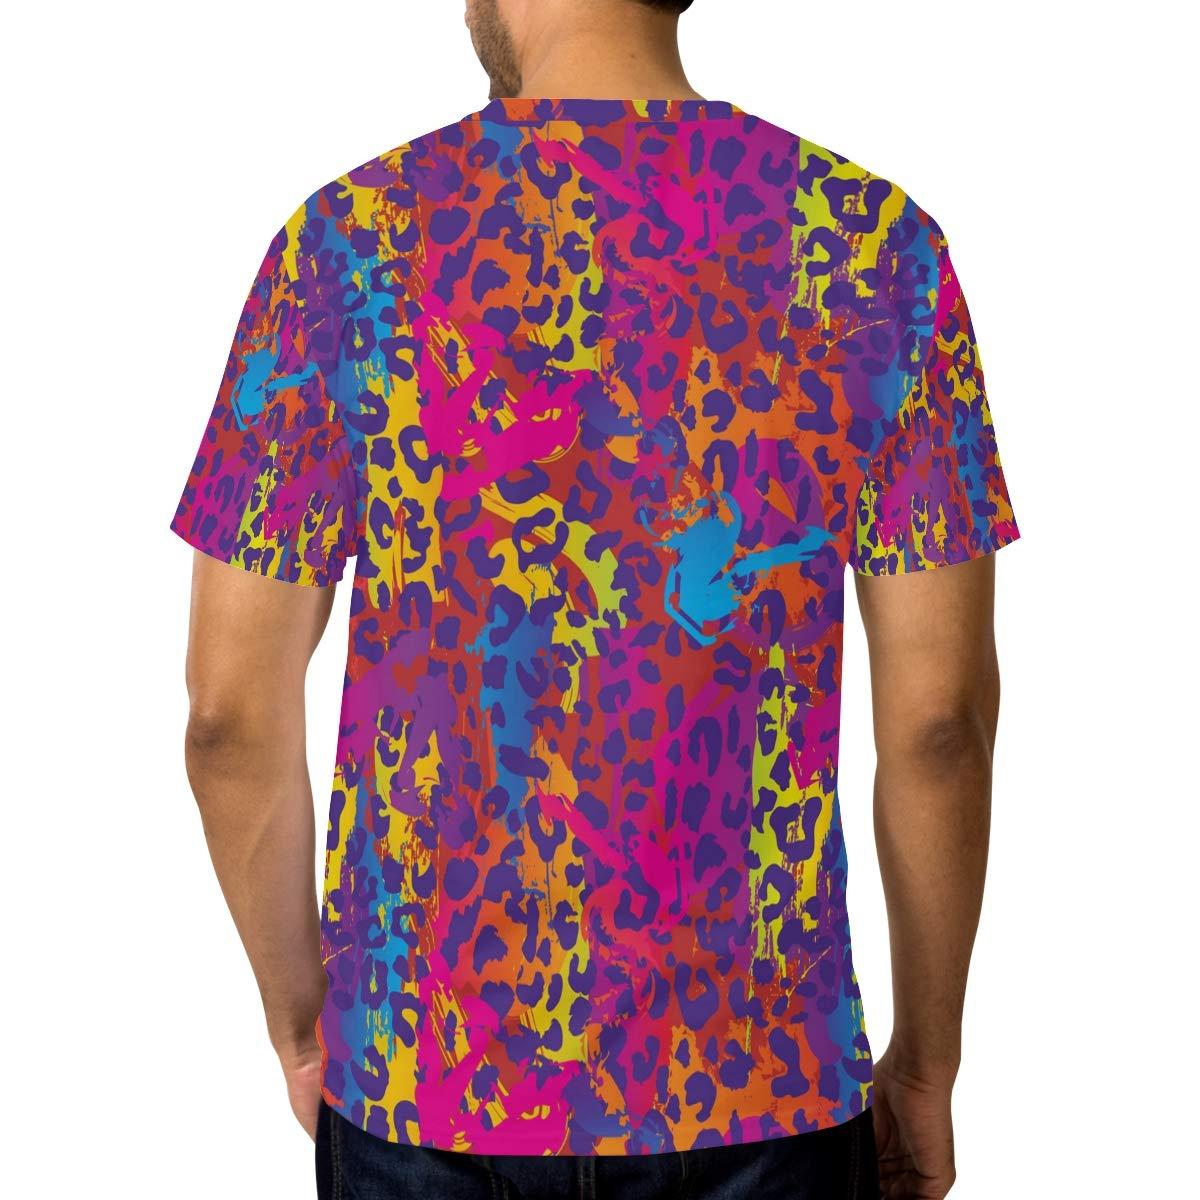 Horatiood Huberyyd Graffiti Leopard Print Decor Mens T Shirts Graphic Funny Body Print Short T-Shirt Unisex Pullover Blouse